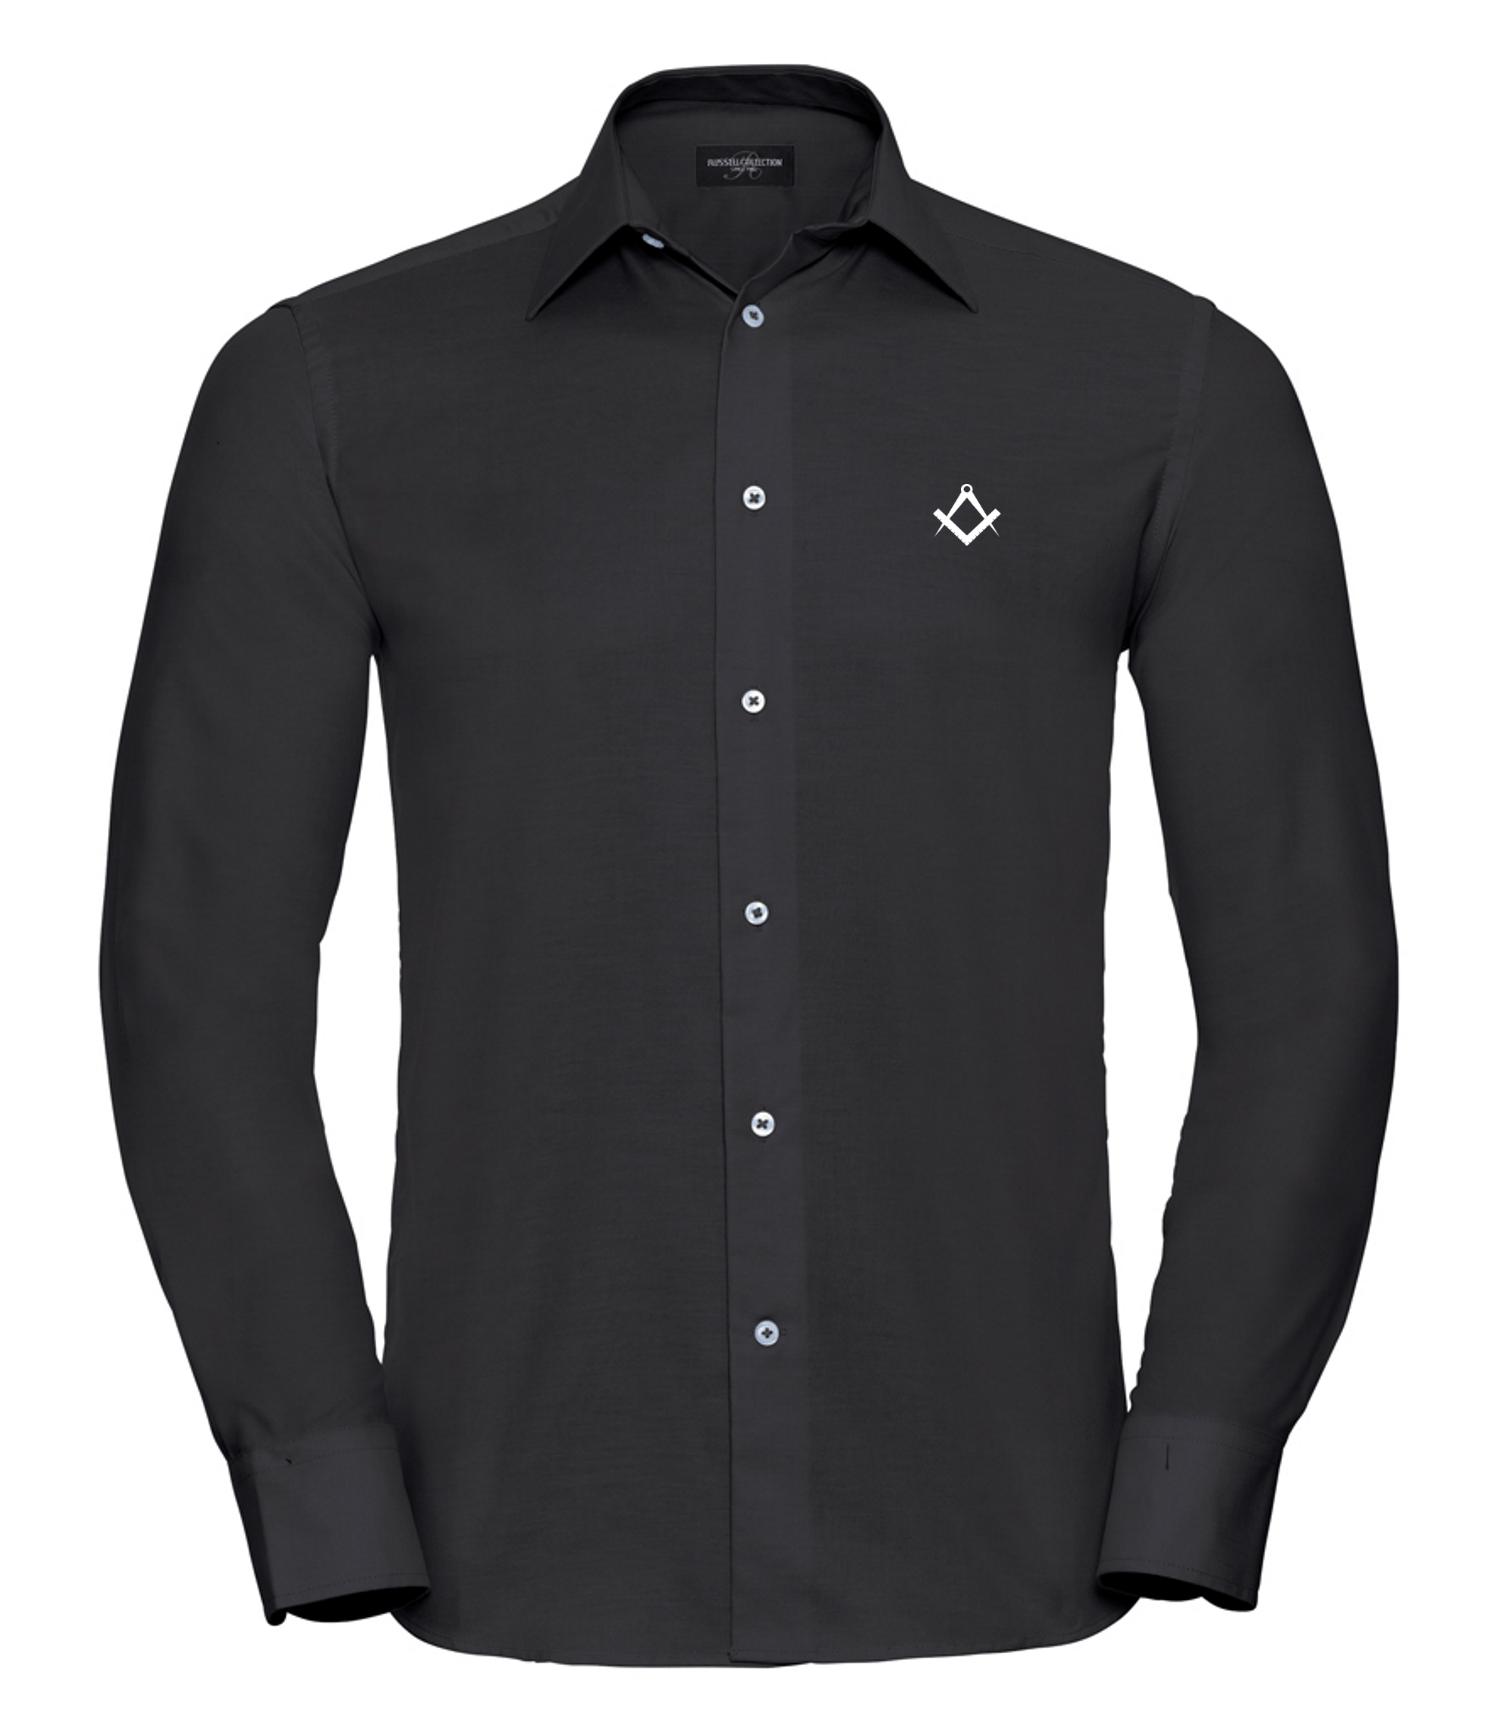 7c2c4324 Smart/Casual shirt - Printed - A lovely Freemasons gift or present Masonic